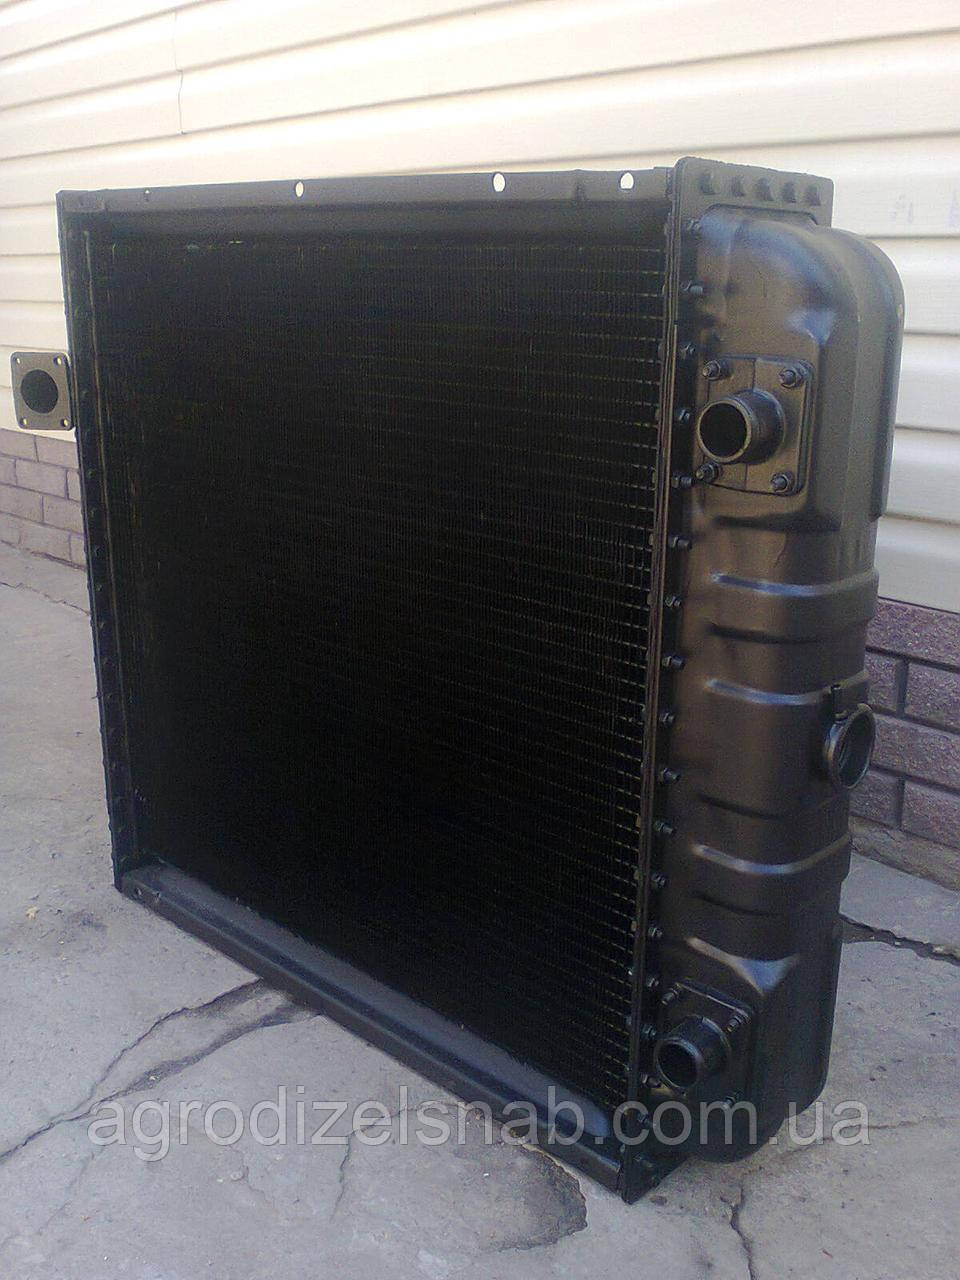 Радиатор водяного охлаждения комбайн ДОН-1500 (6-ти рядн.) 250У.13010-4 (пр-во г.Оренбург)